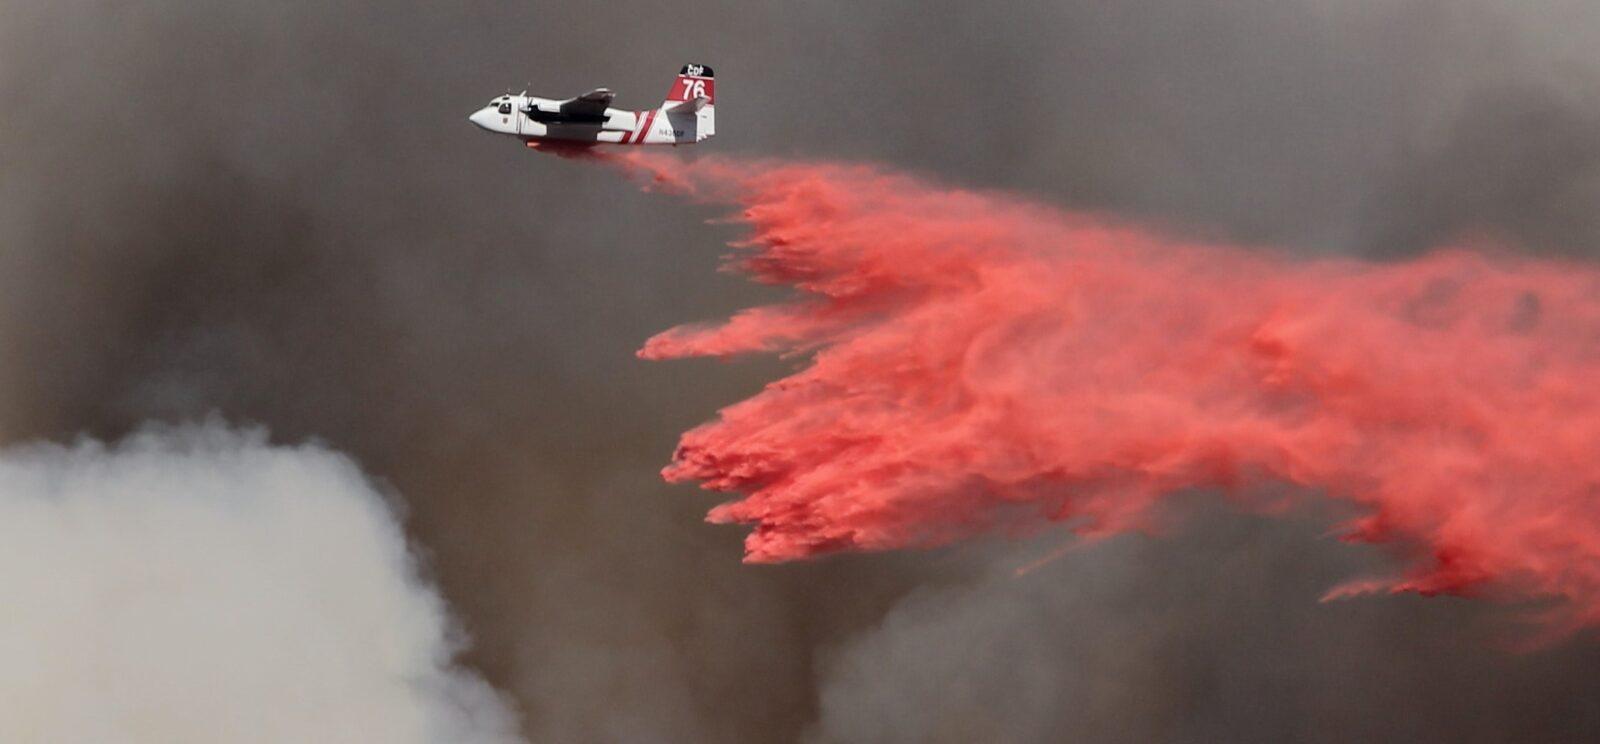 tanker drops fire retardant on wildfires amidst smoke cloud